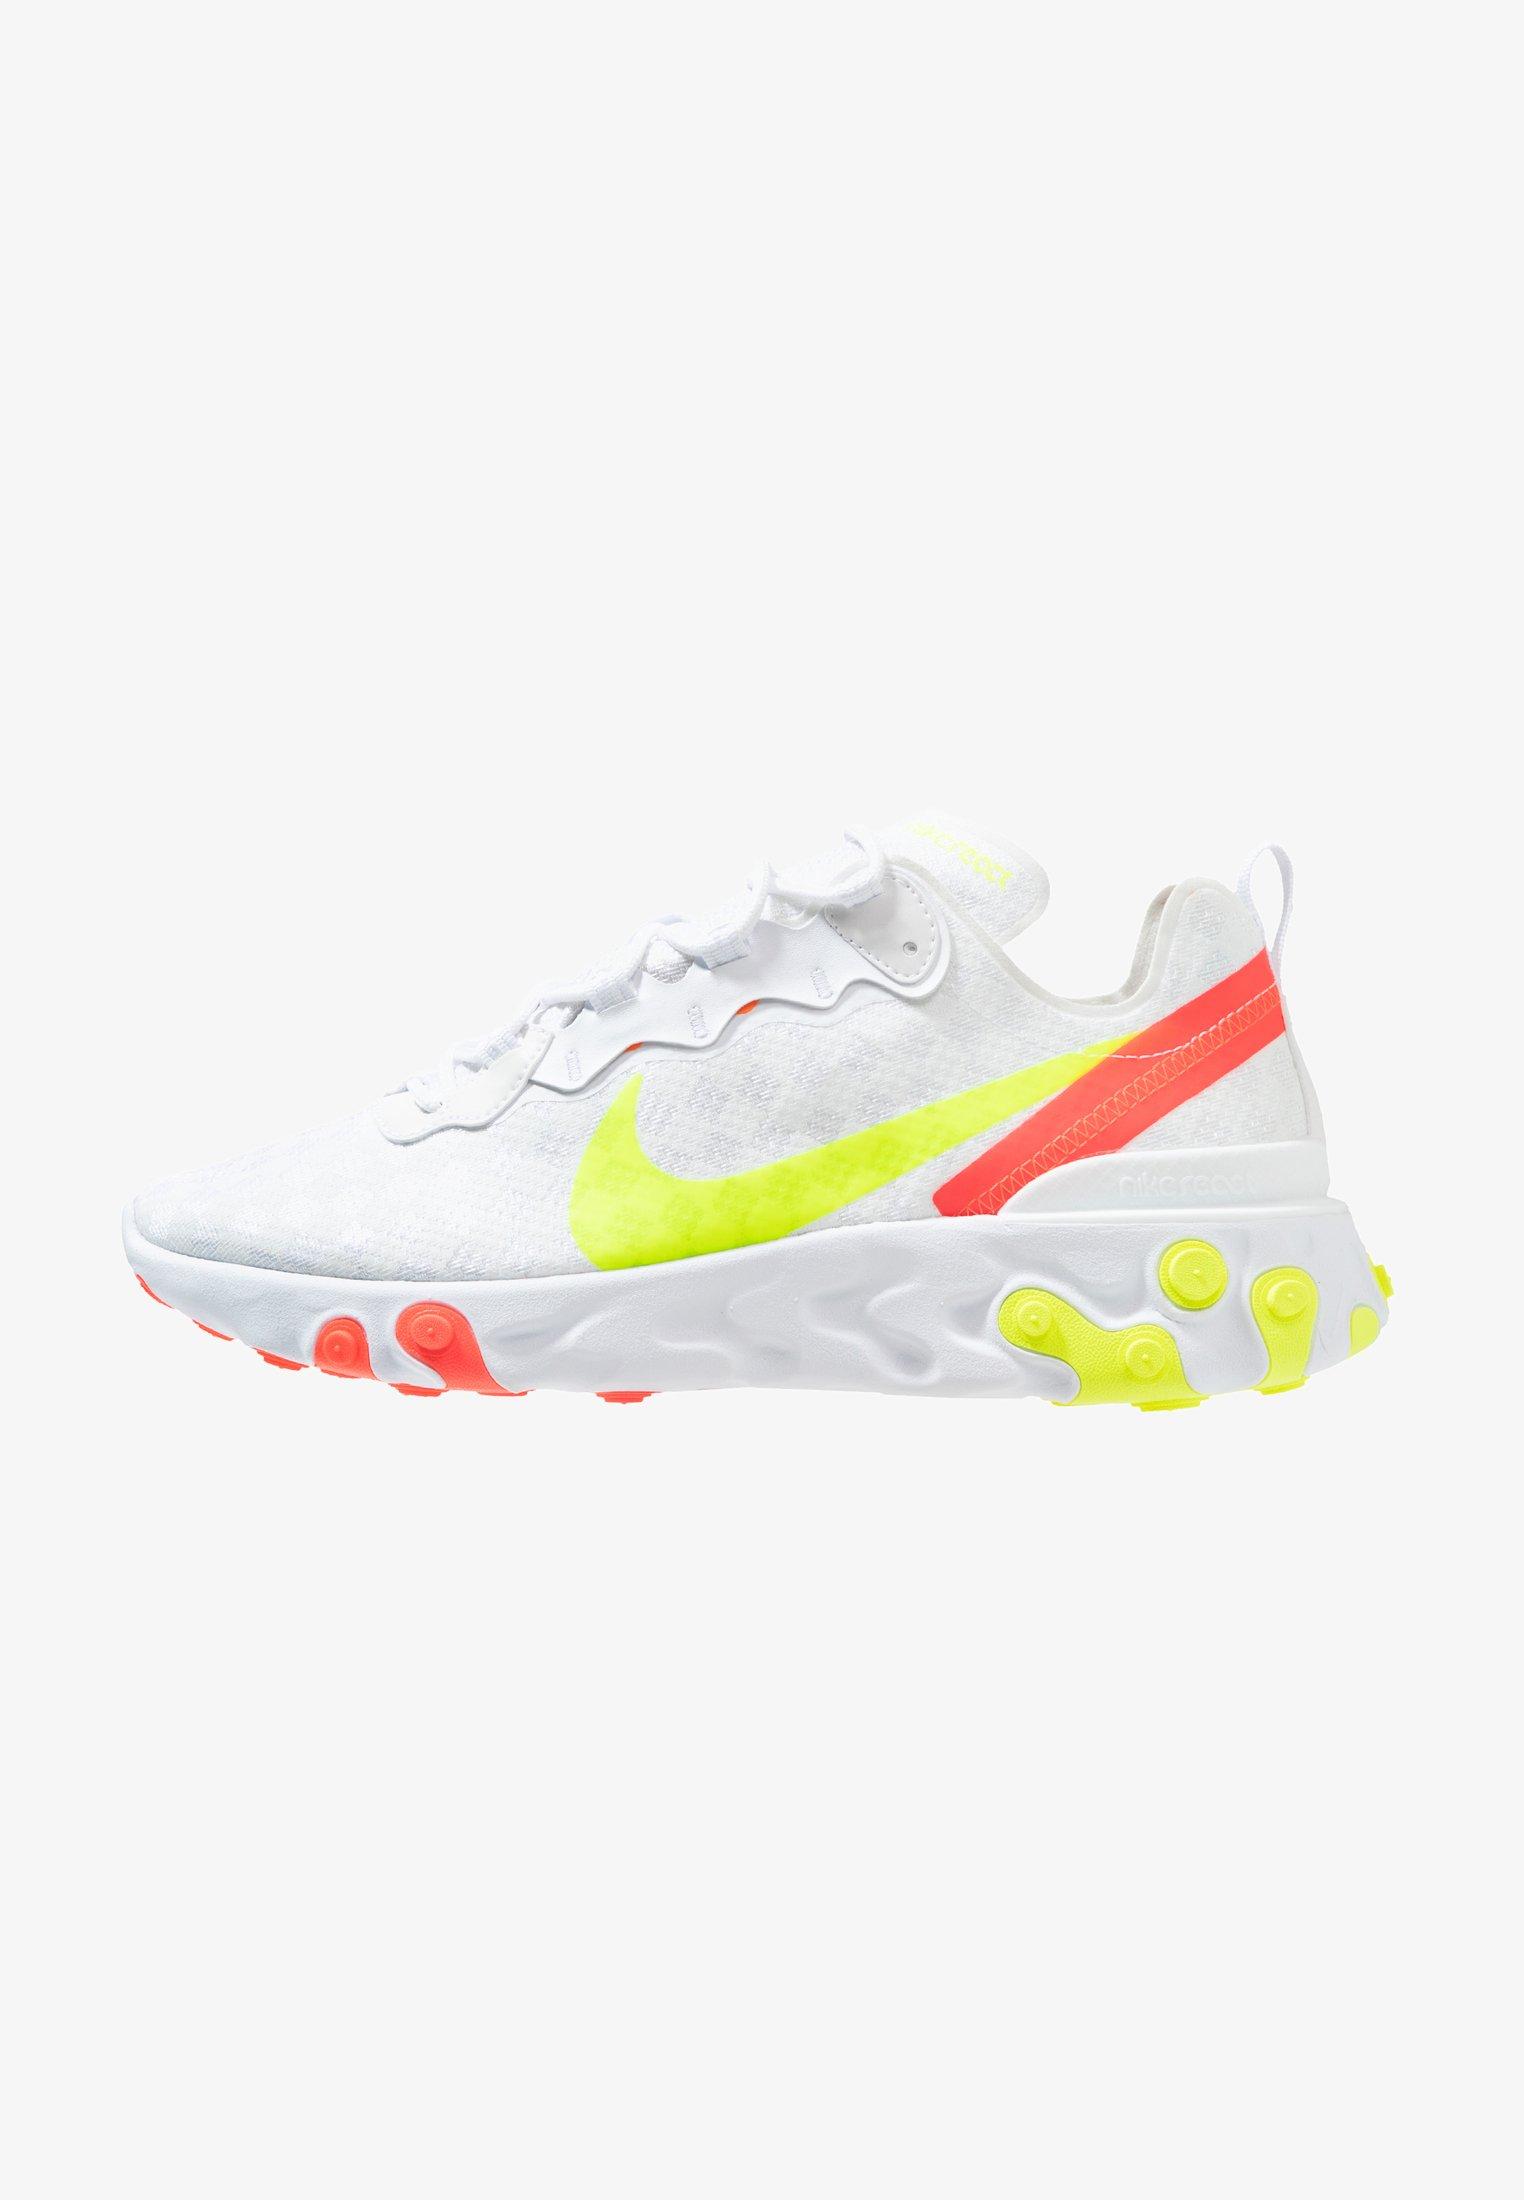 Dirigir Detectable deseable  Nike Sportswear REACT ELEMENT 55 - Trainers - white/volt/flash  crimson/hyper crimson/white - Zalando.co.uk